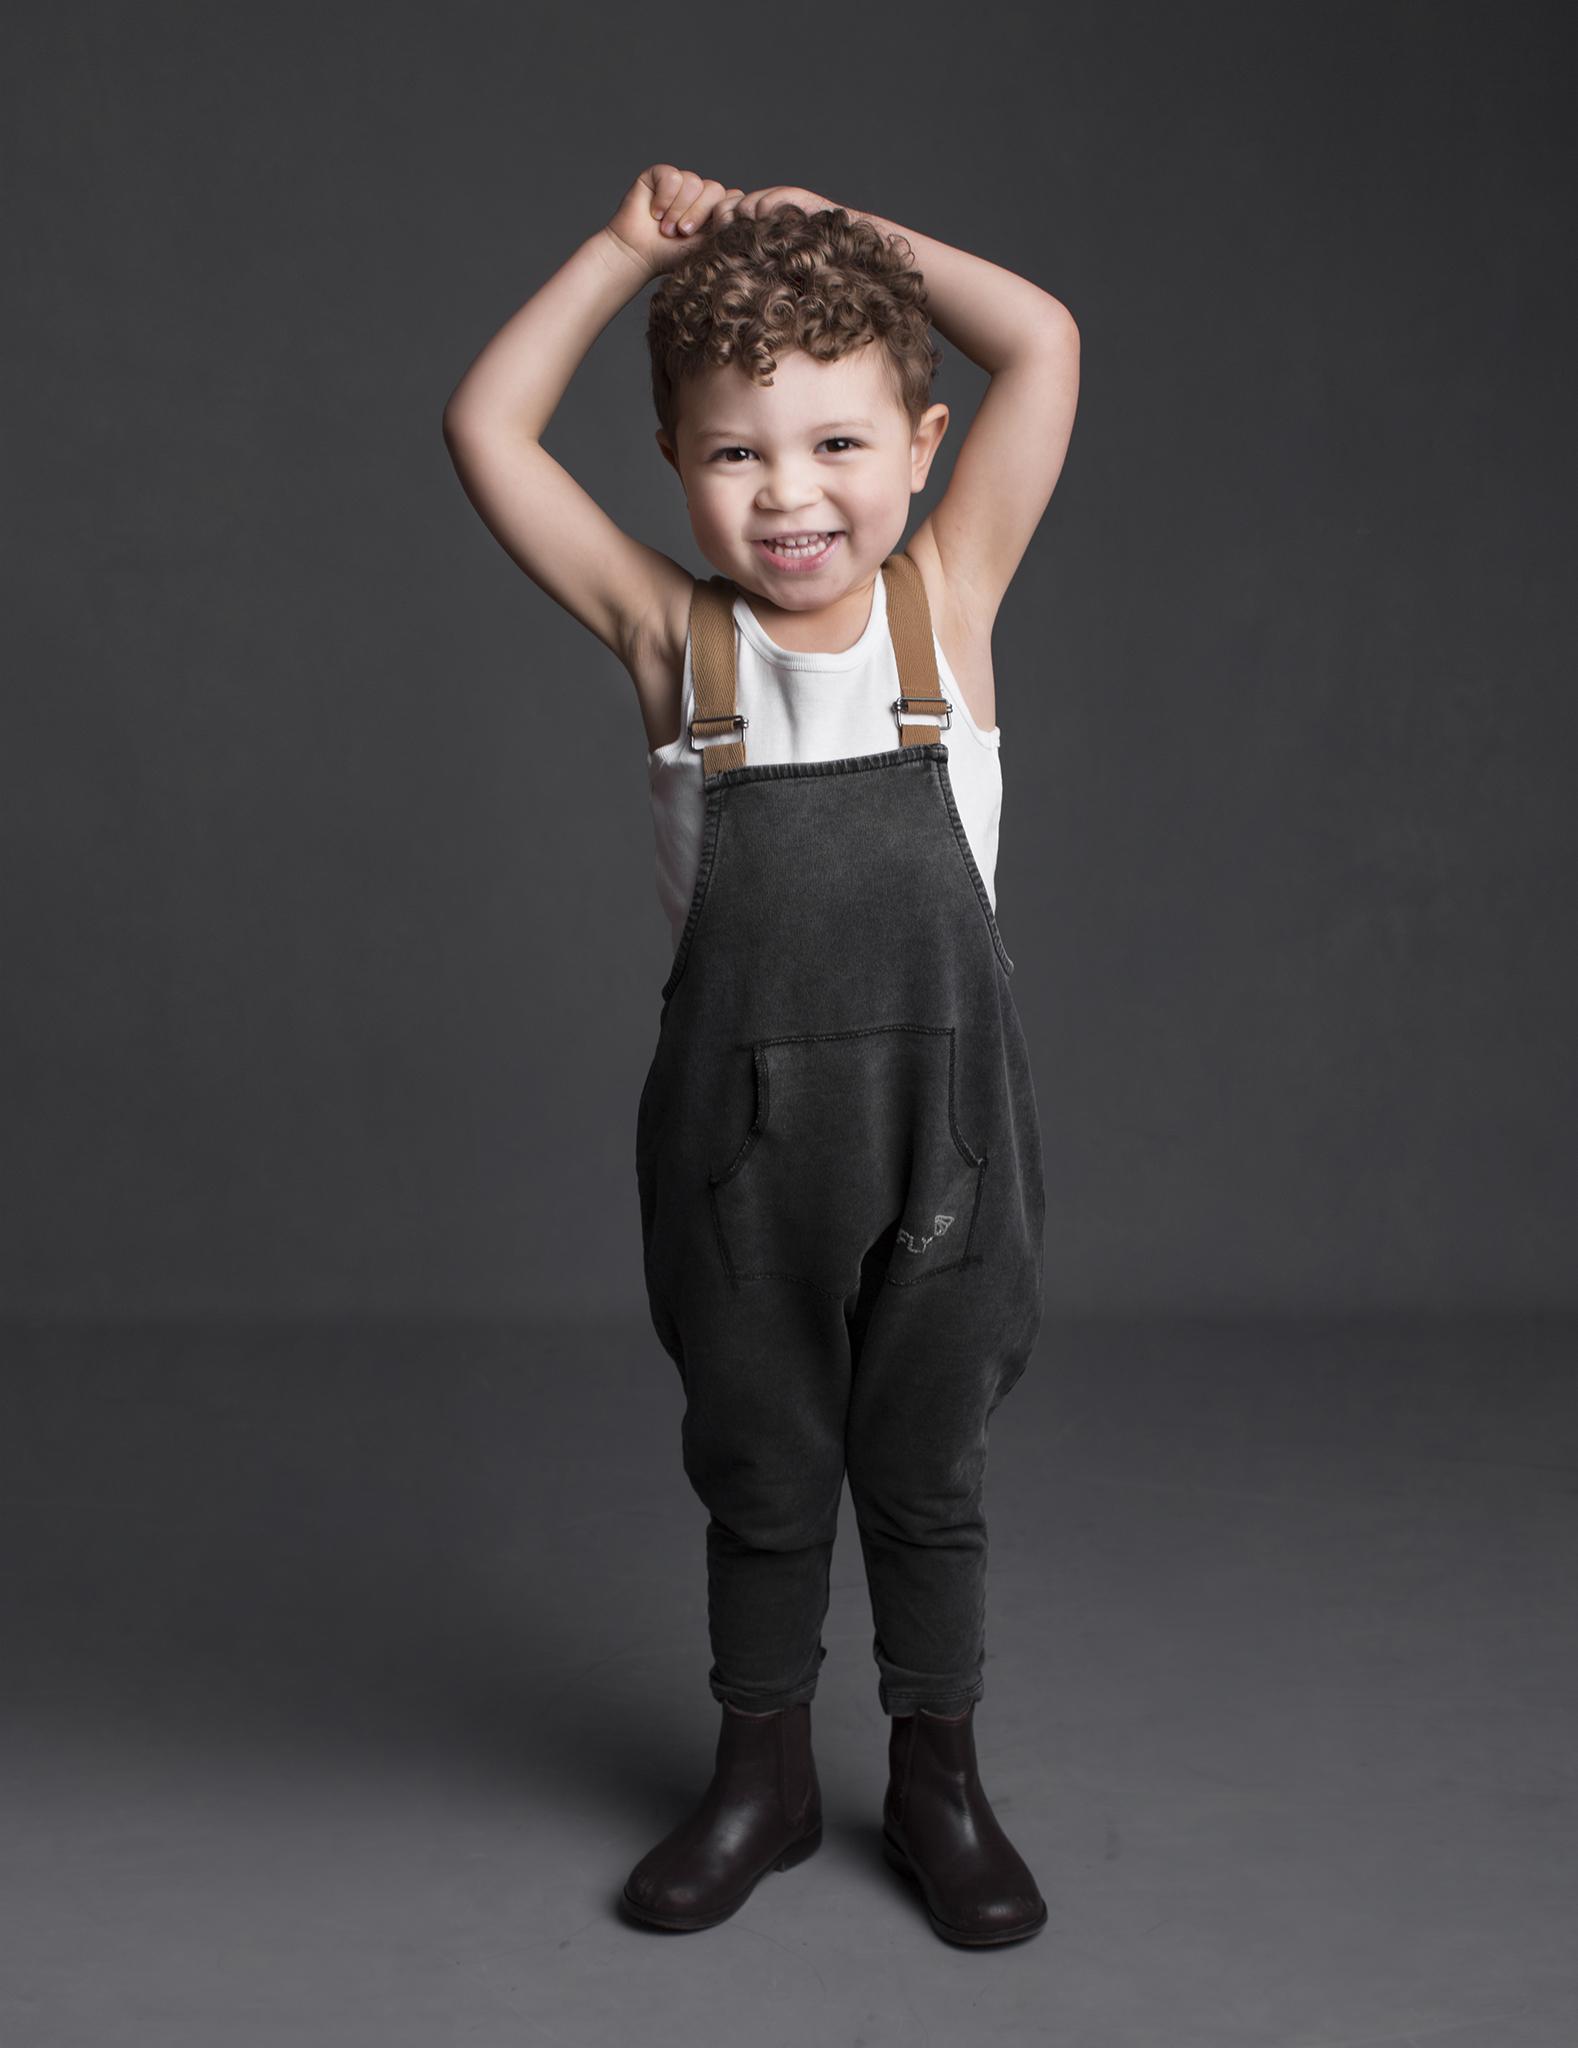 elizabethgphotography_fineart_kingslangley_hertfordshire_child_model_hudson2.jpg